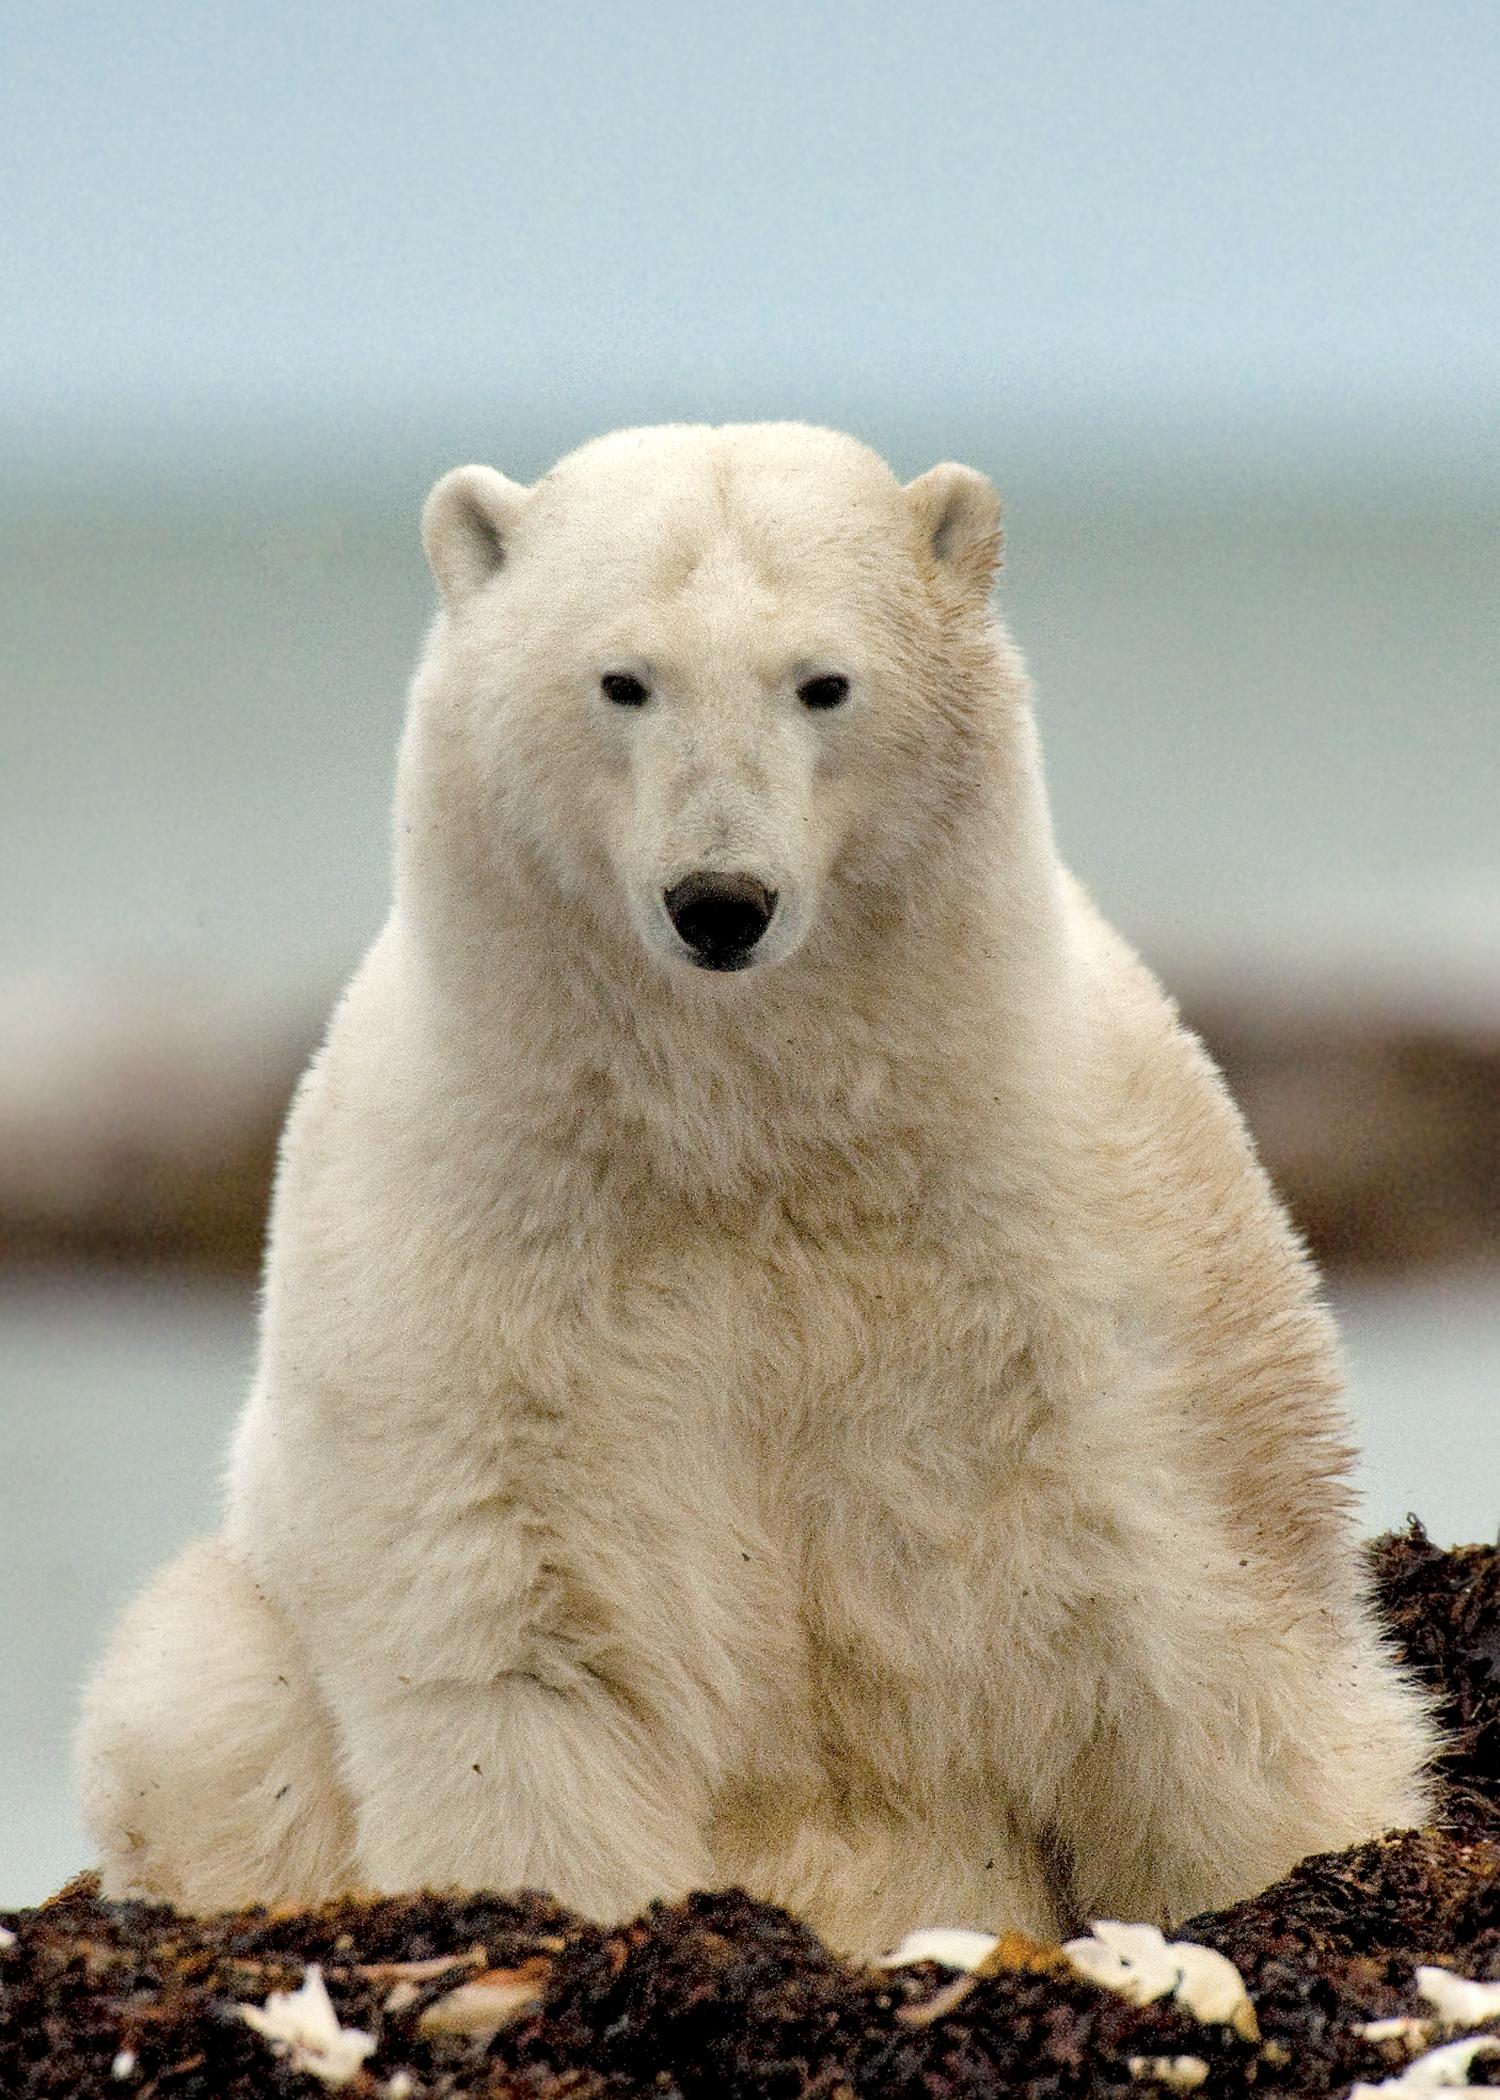 MICHELLE_VALBERG_Polar Bear_V3X2117.jpg